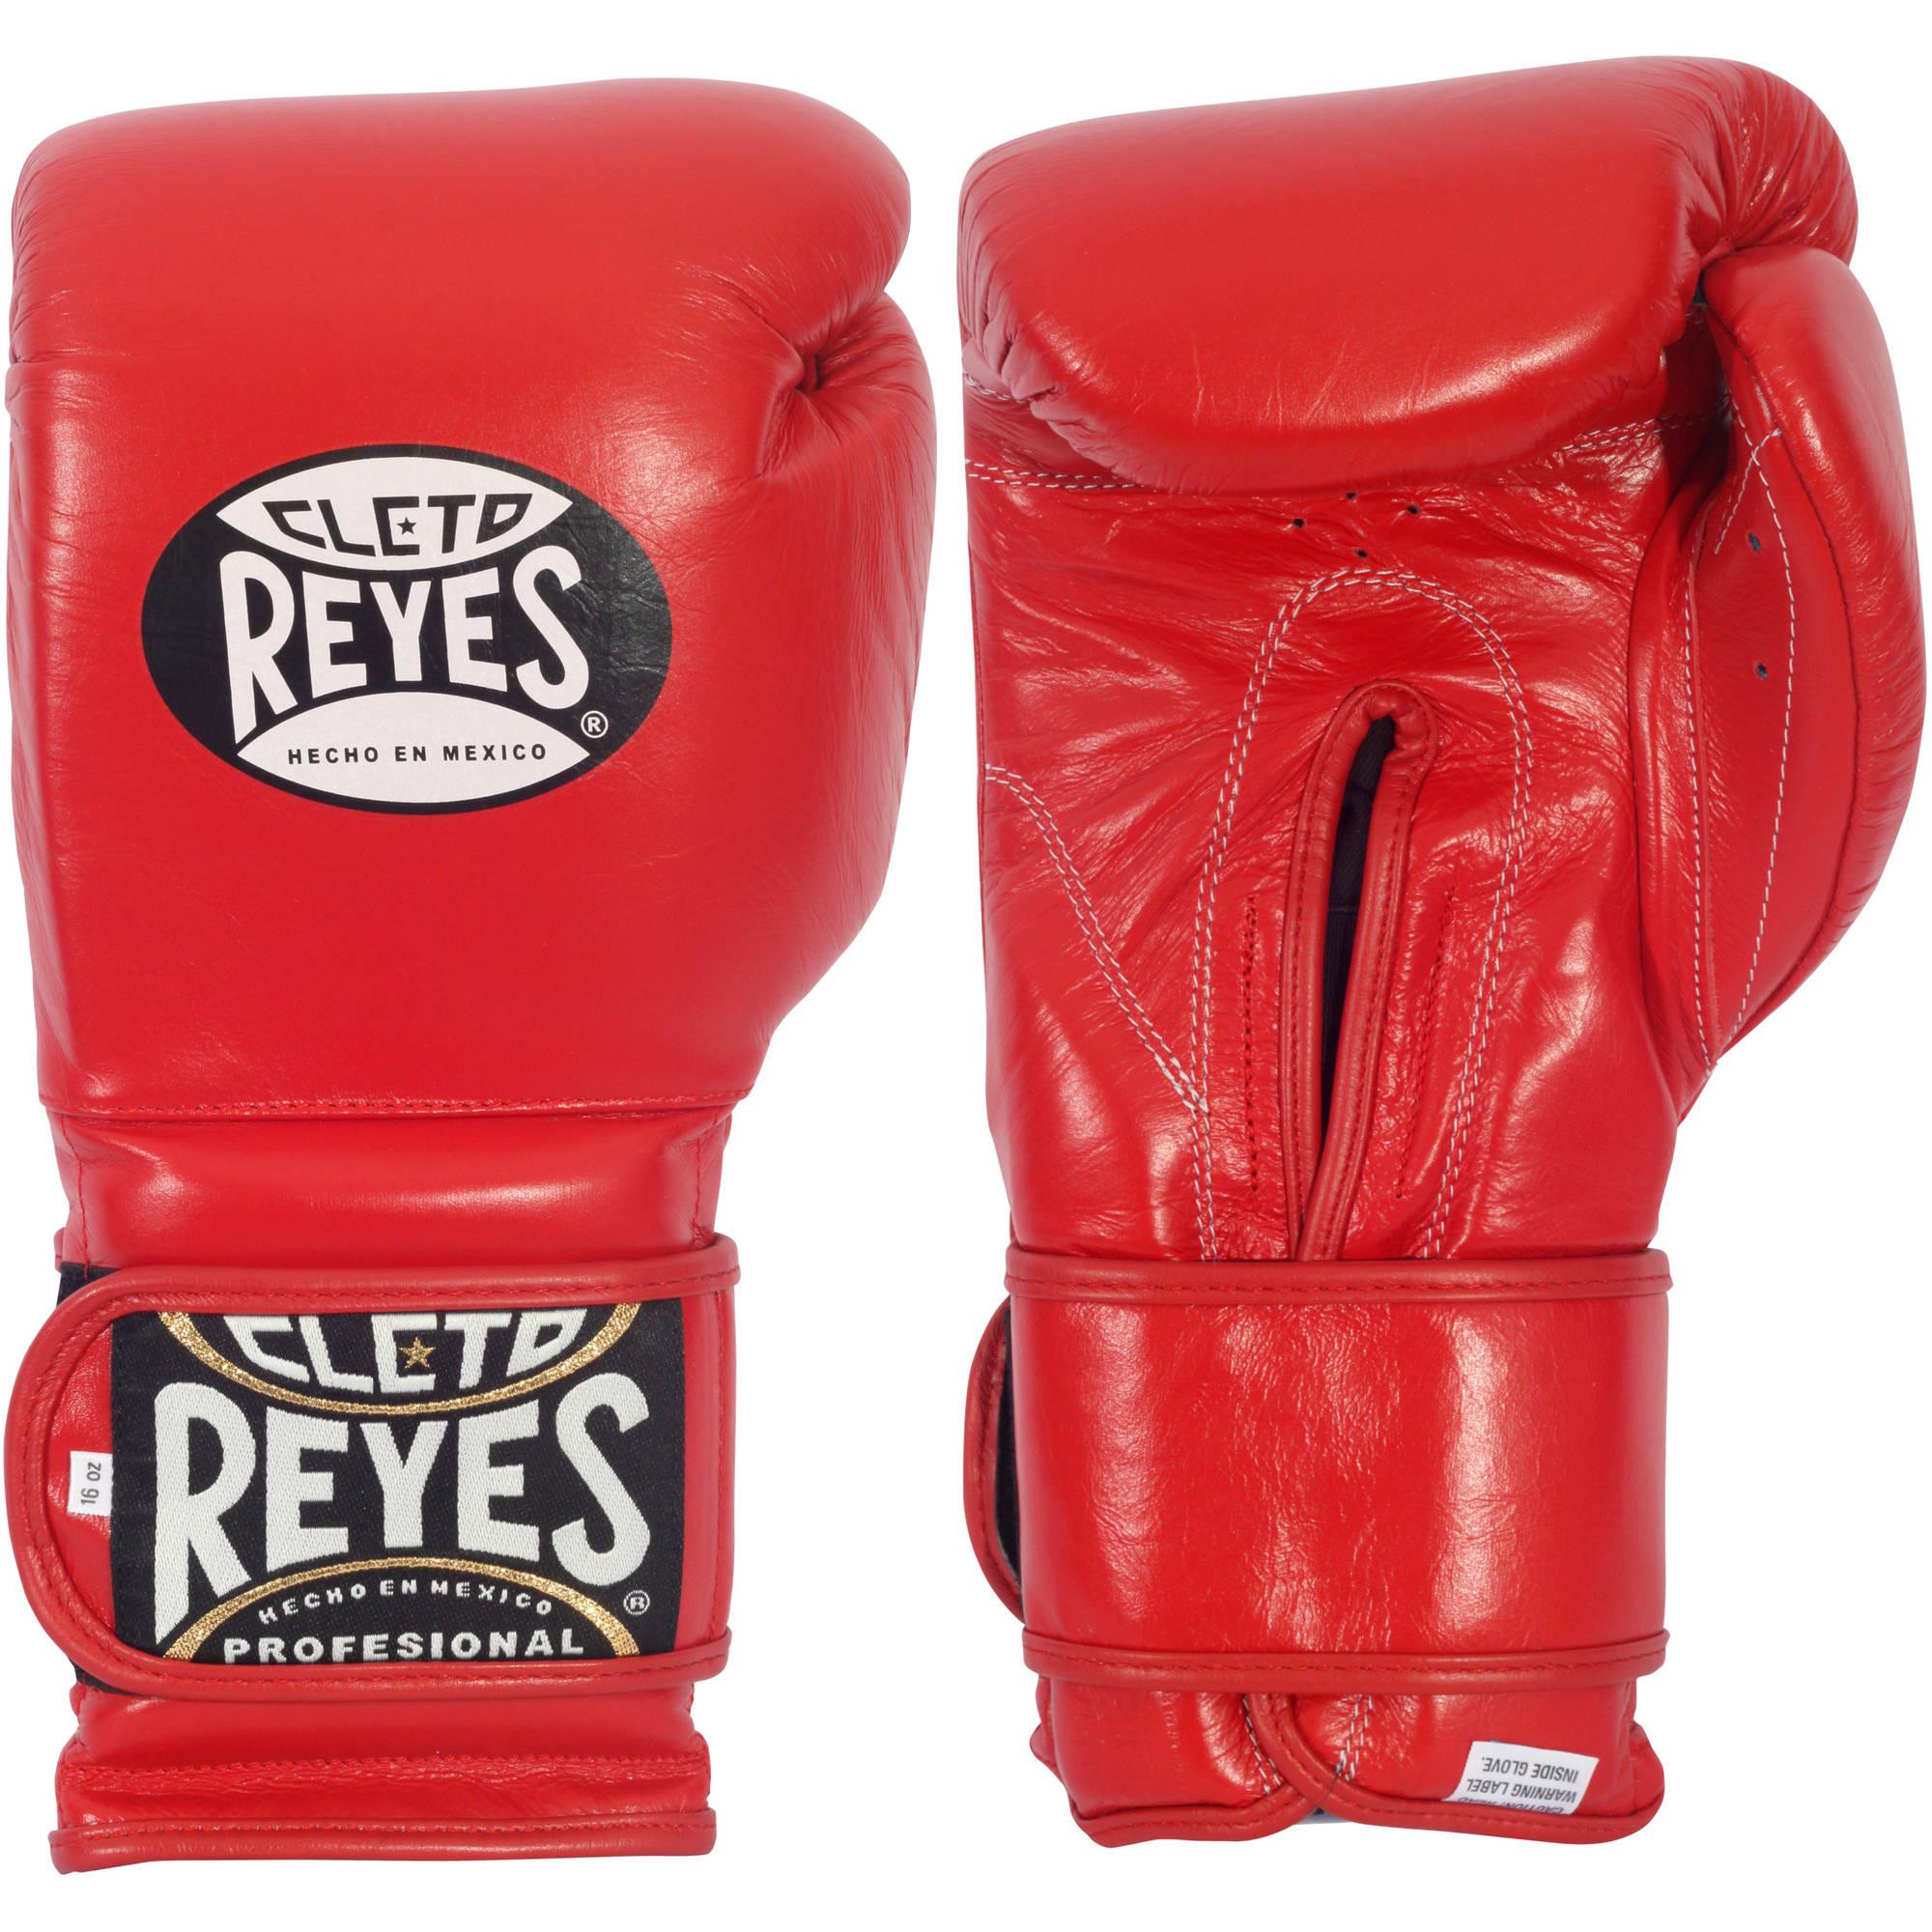 Cleto Reyes Hook and Loop Boxing Gloves, 16oz, Red